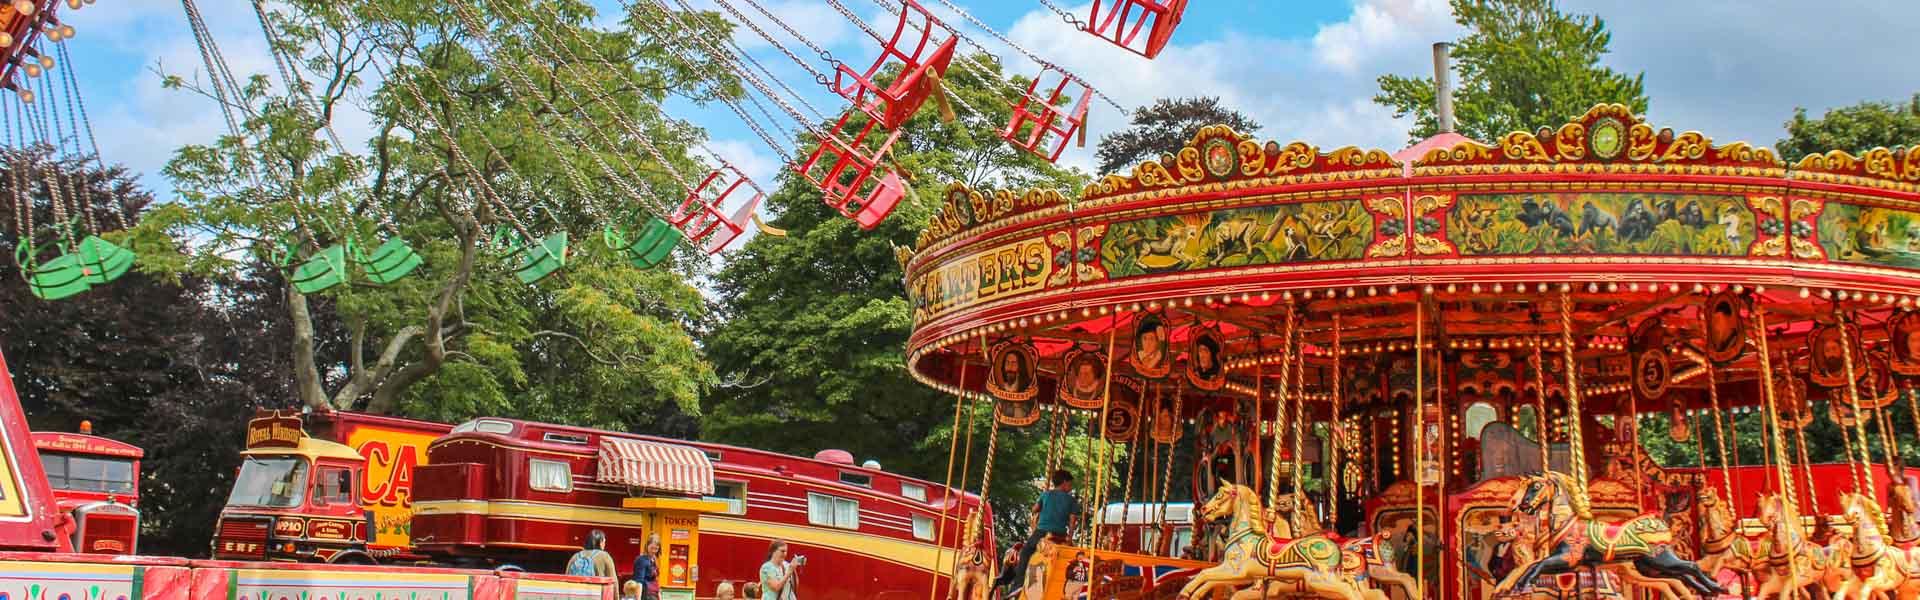 Vintage Funfair Rides Attractions Carters Steam Fair